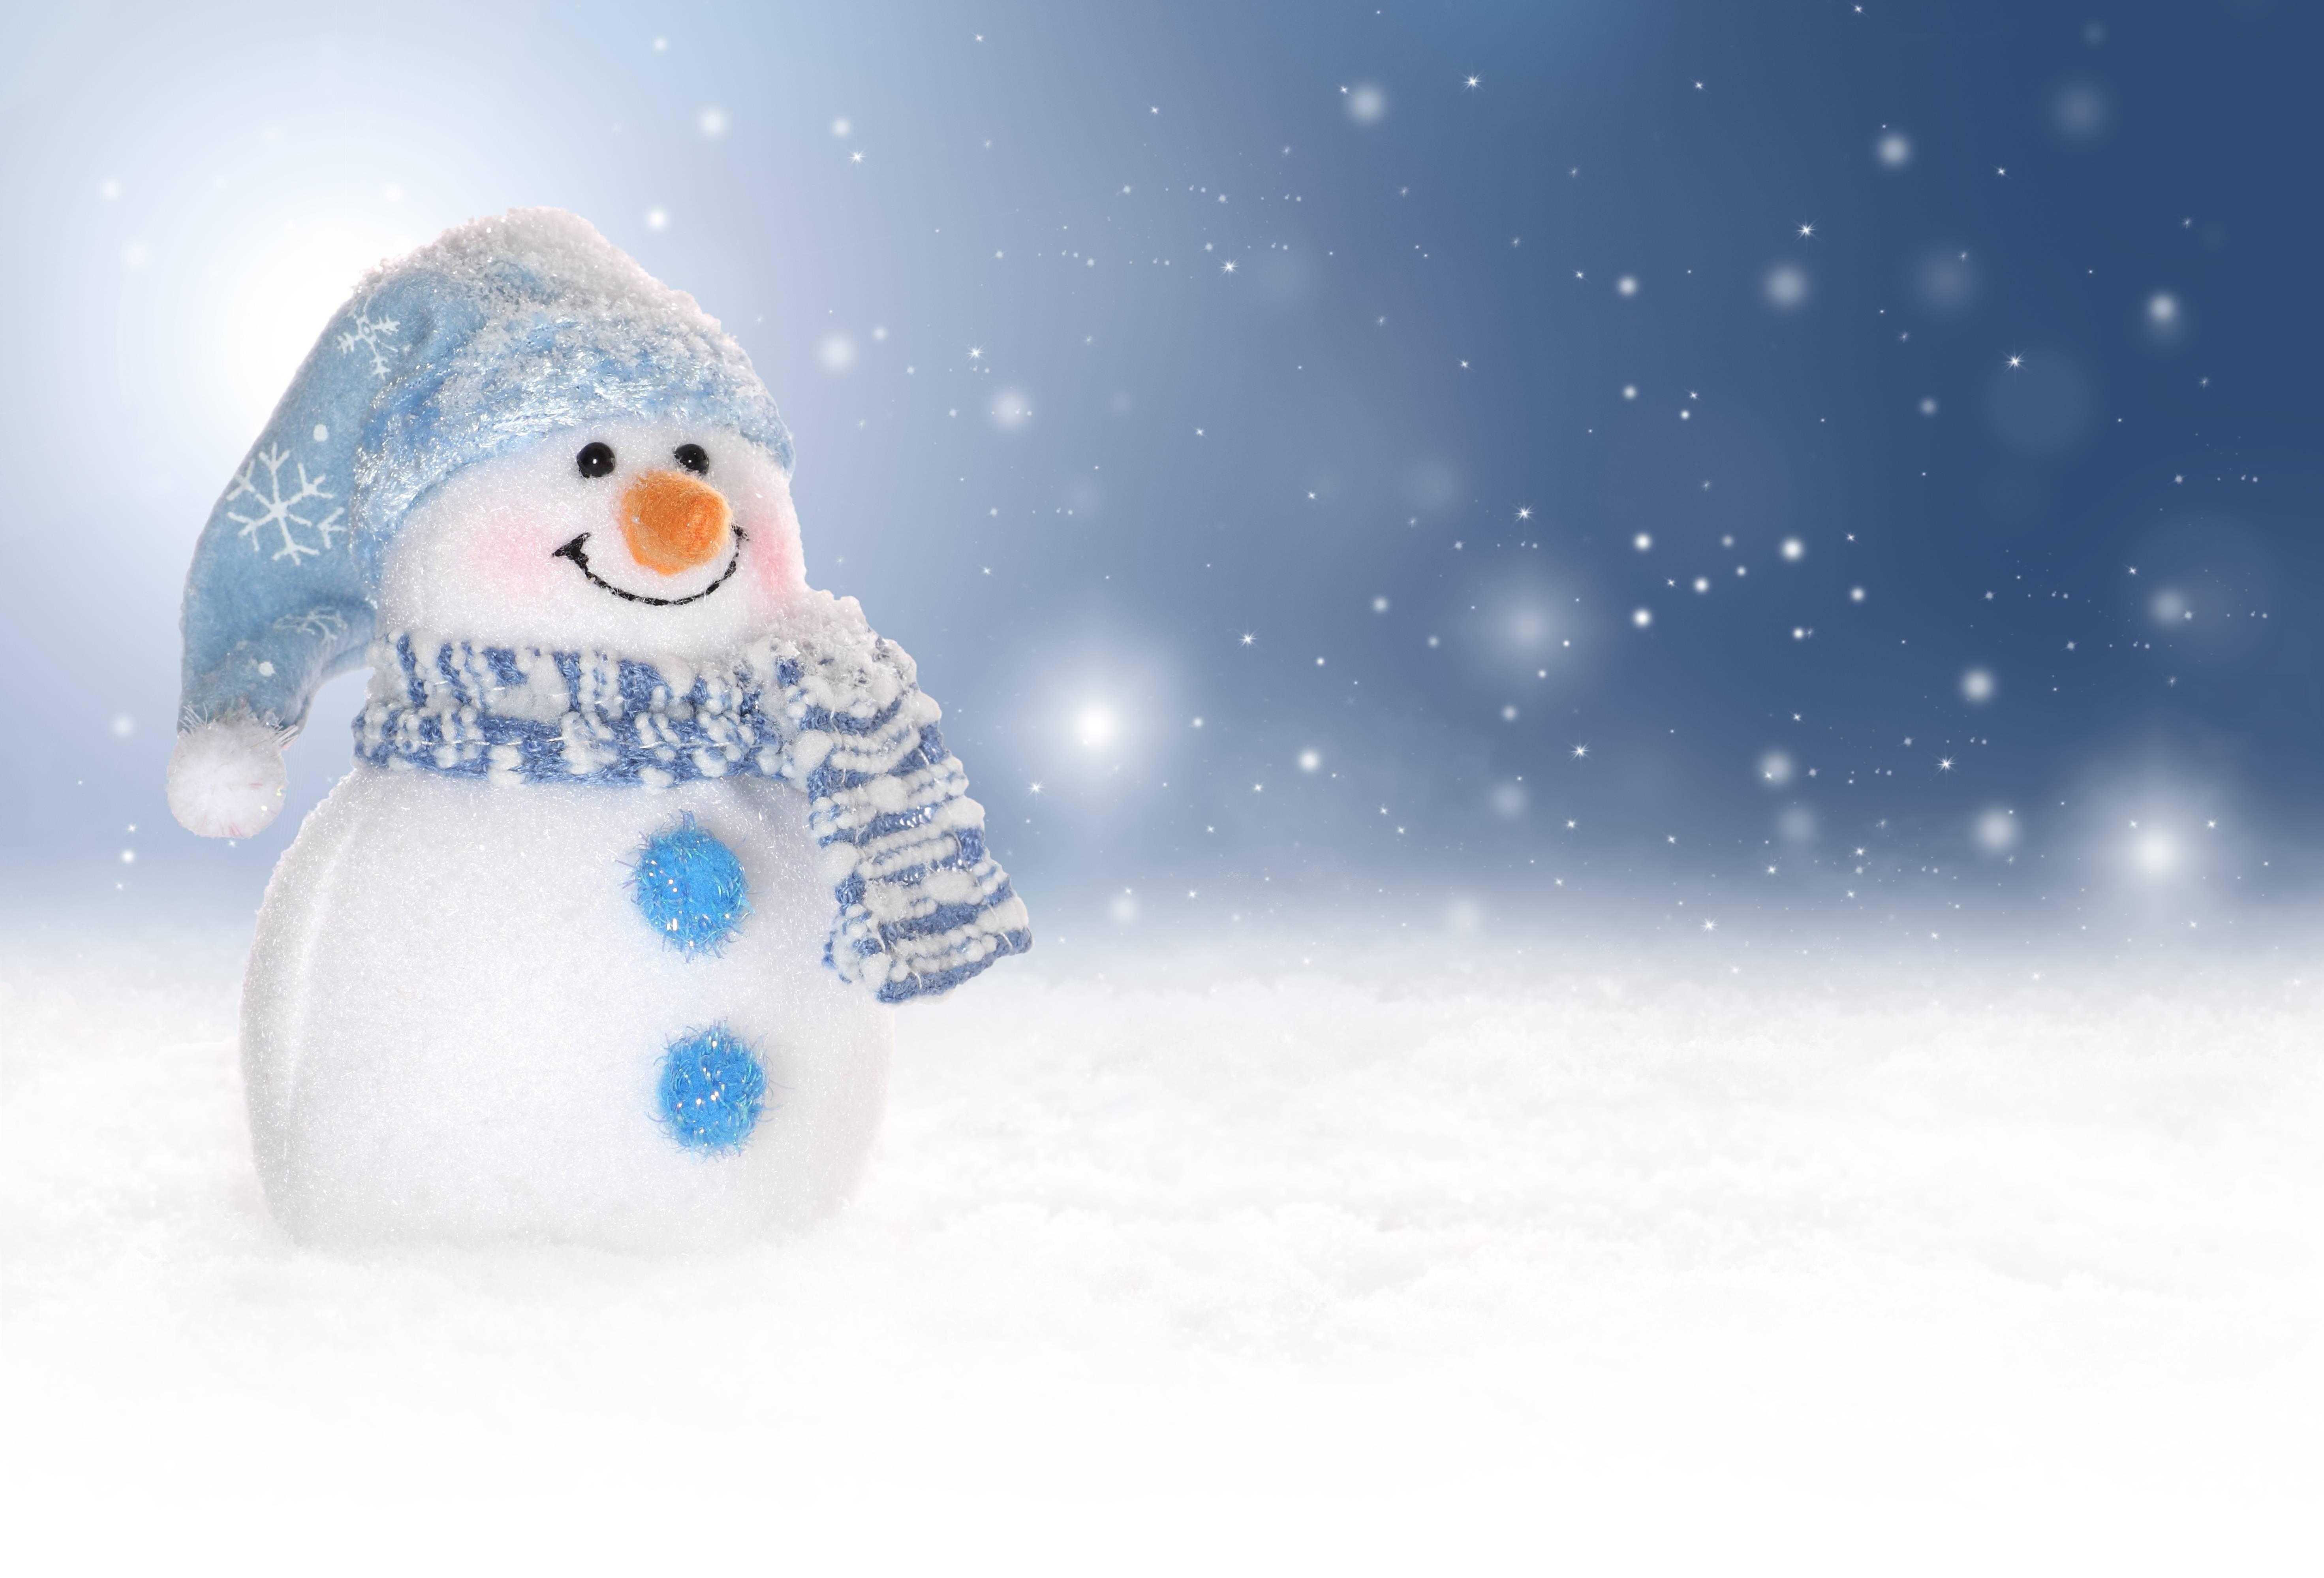 Winter Backgrounds for Desktop 5885x3995